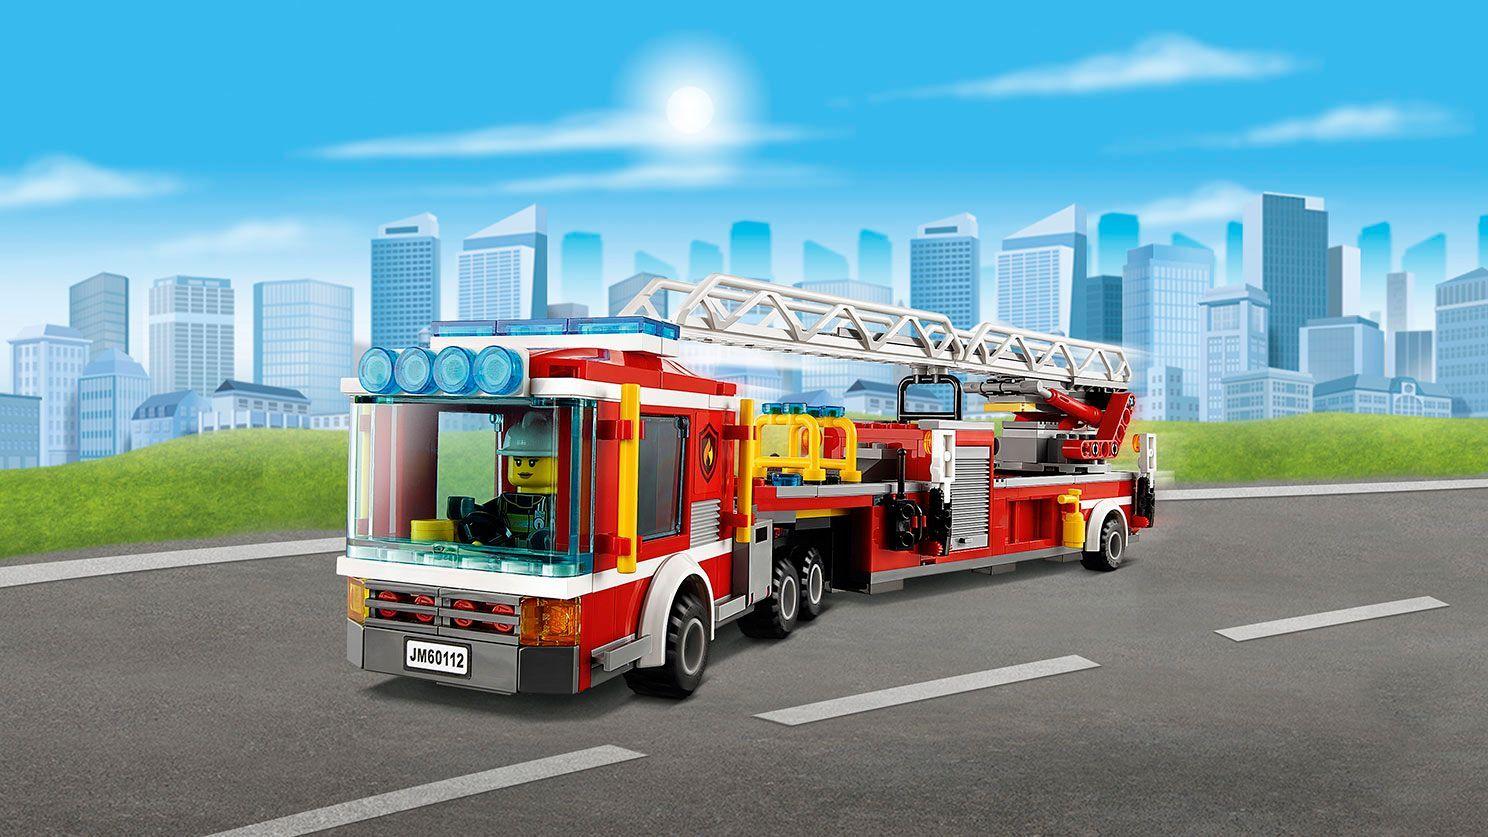 Lego City 60112 Fire Engine Lego Fire Lego City Fire Trucks